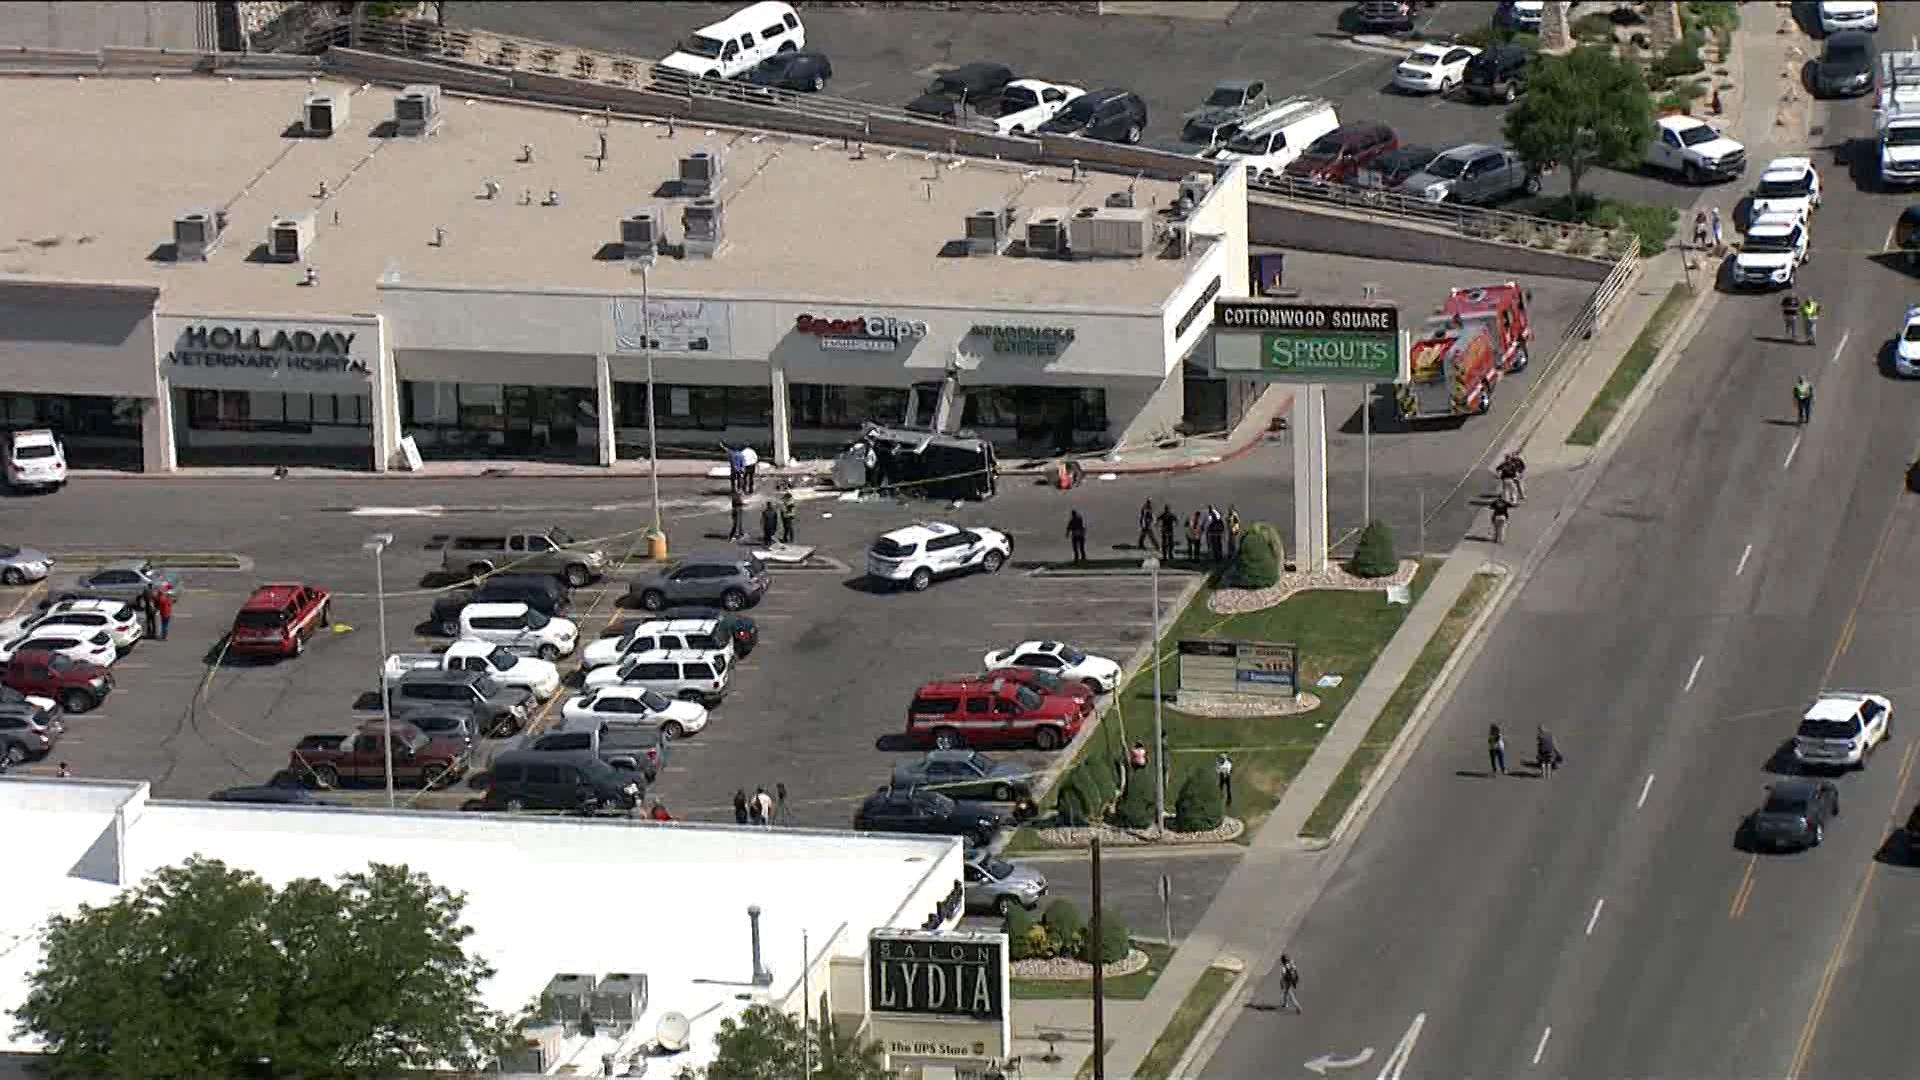 ksl traffic report 1 dead, 5 injured after car crashes into Millcreek Starbucks | KSL.com